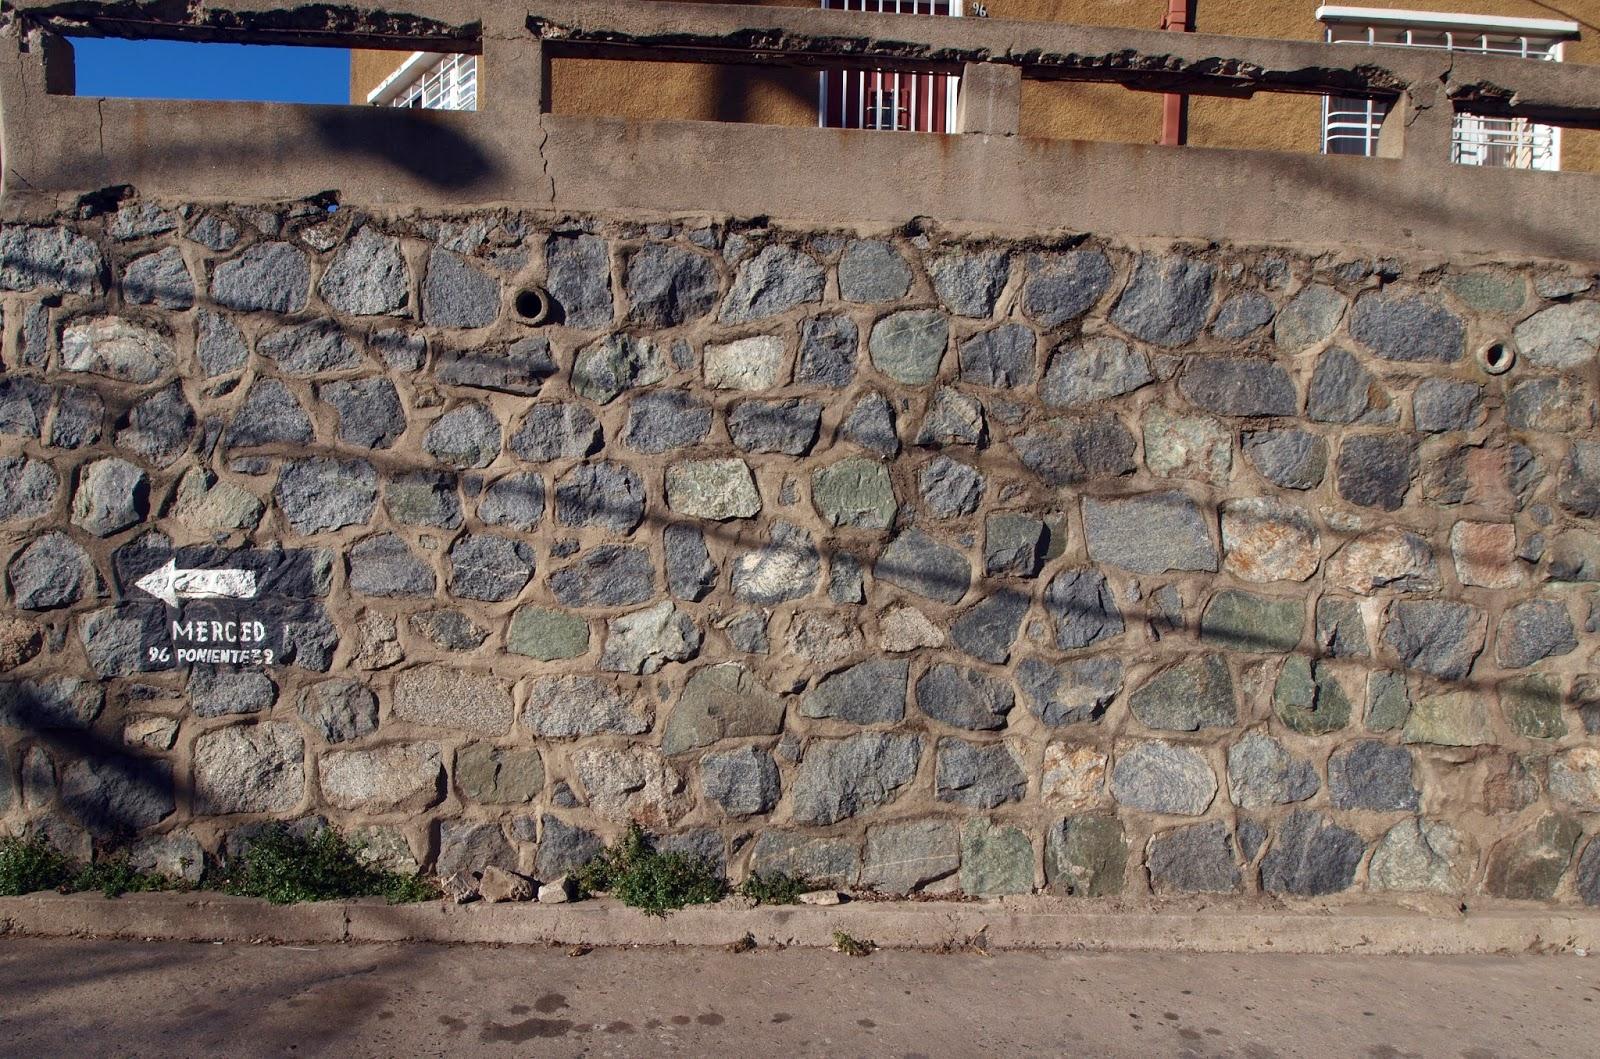 Ventana verde muros de piedra un patrimonio para vi a - Muros de piedra ...